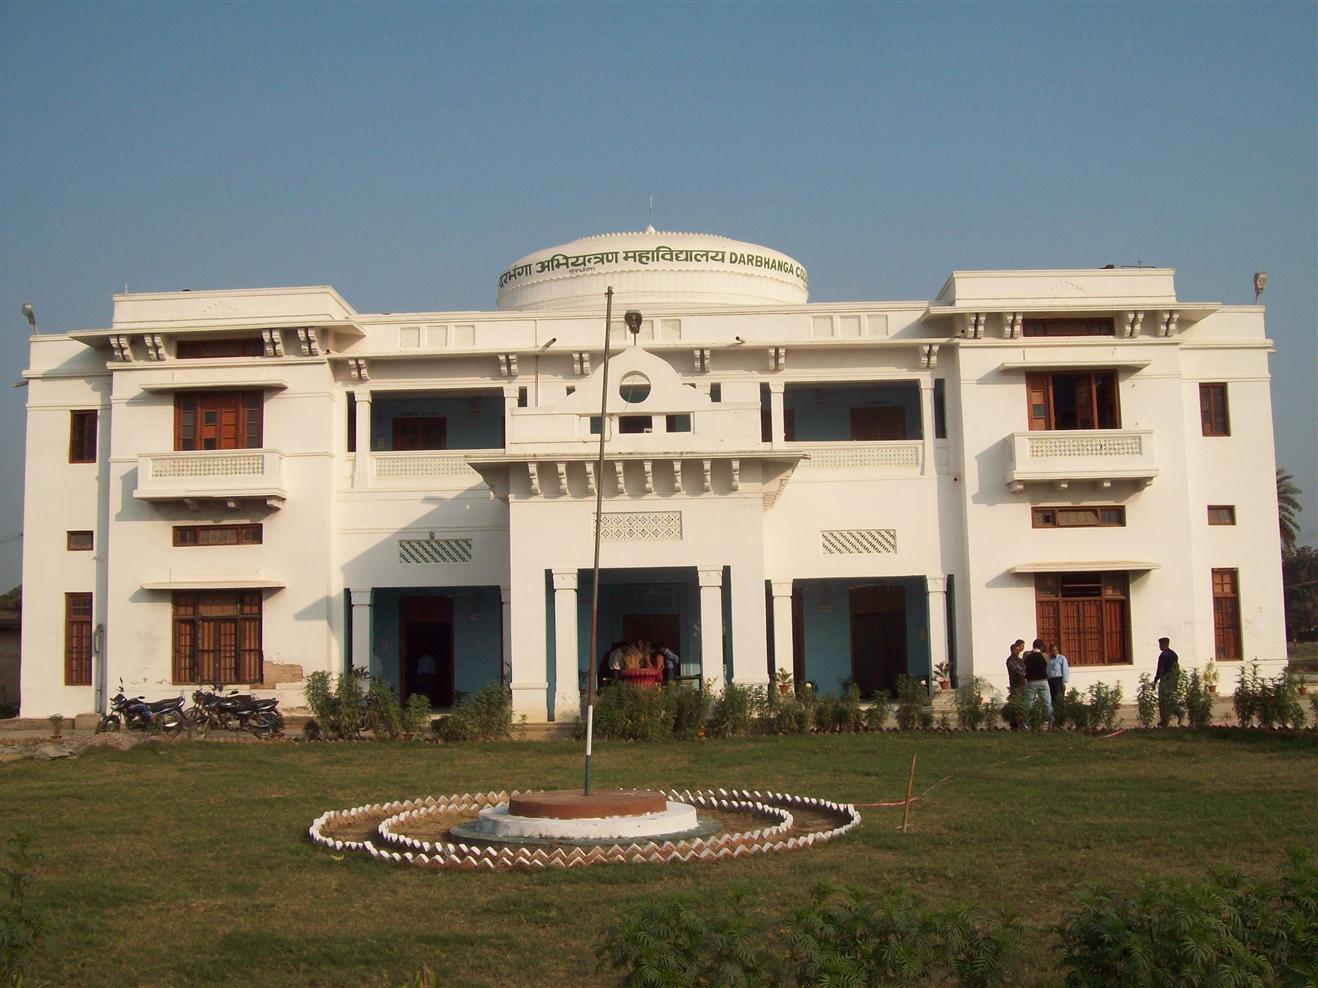 Darbhanga College of Engineering